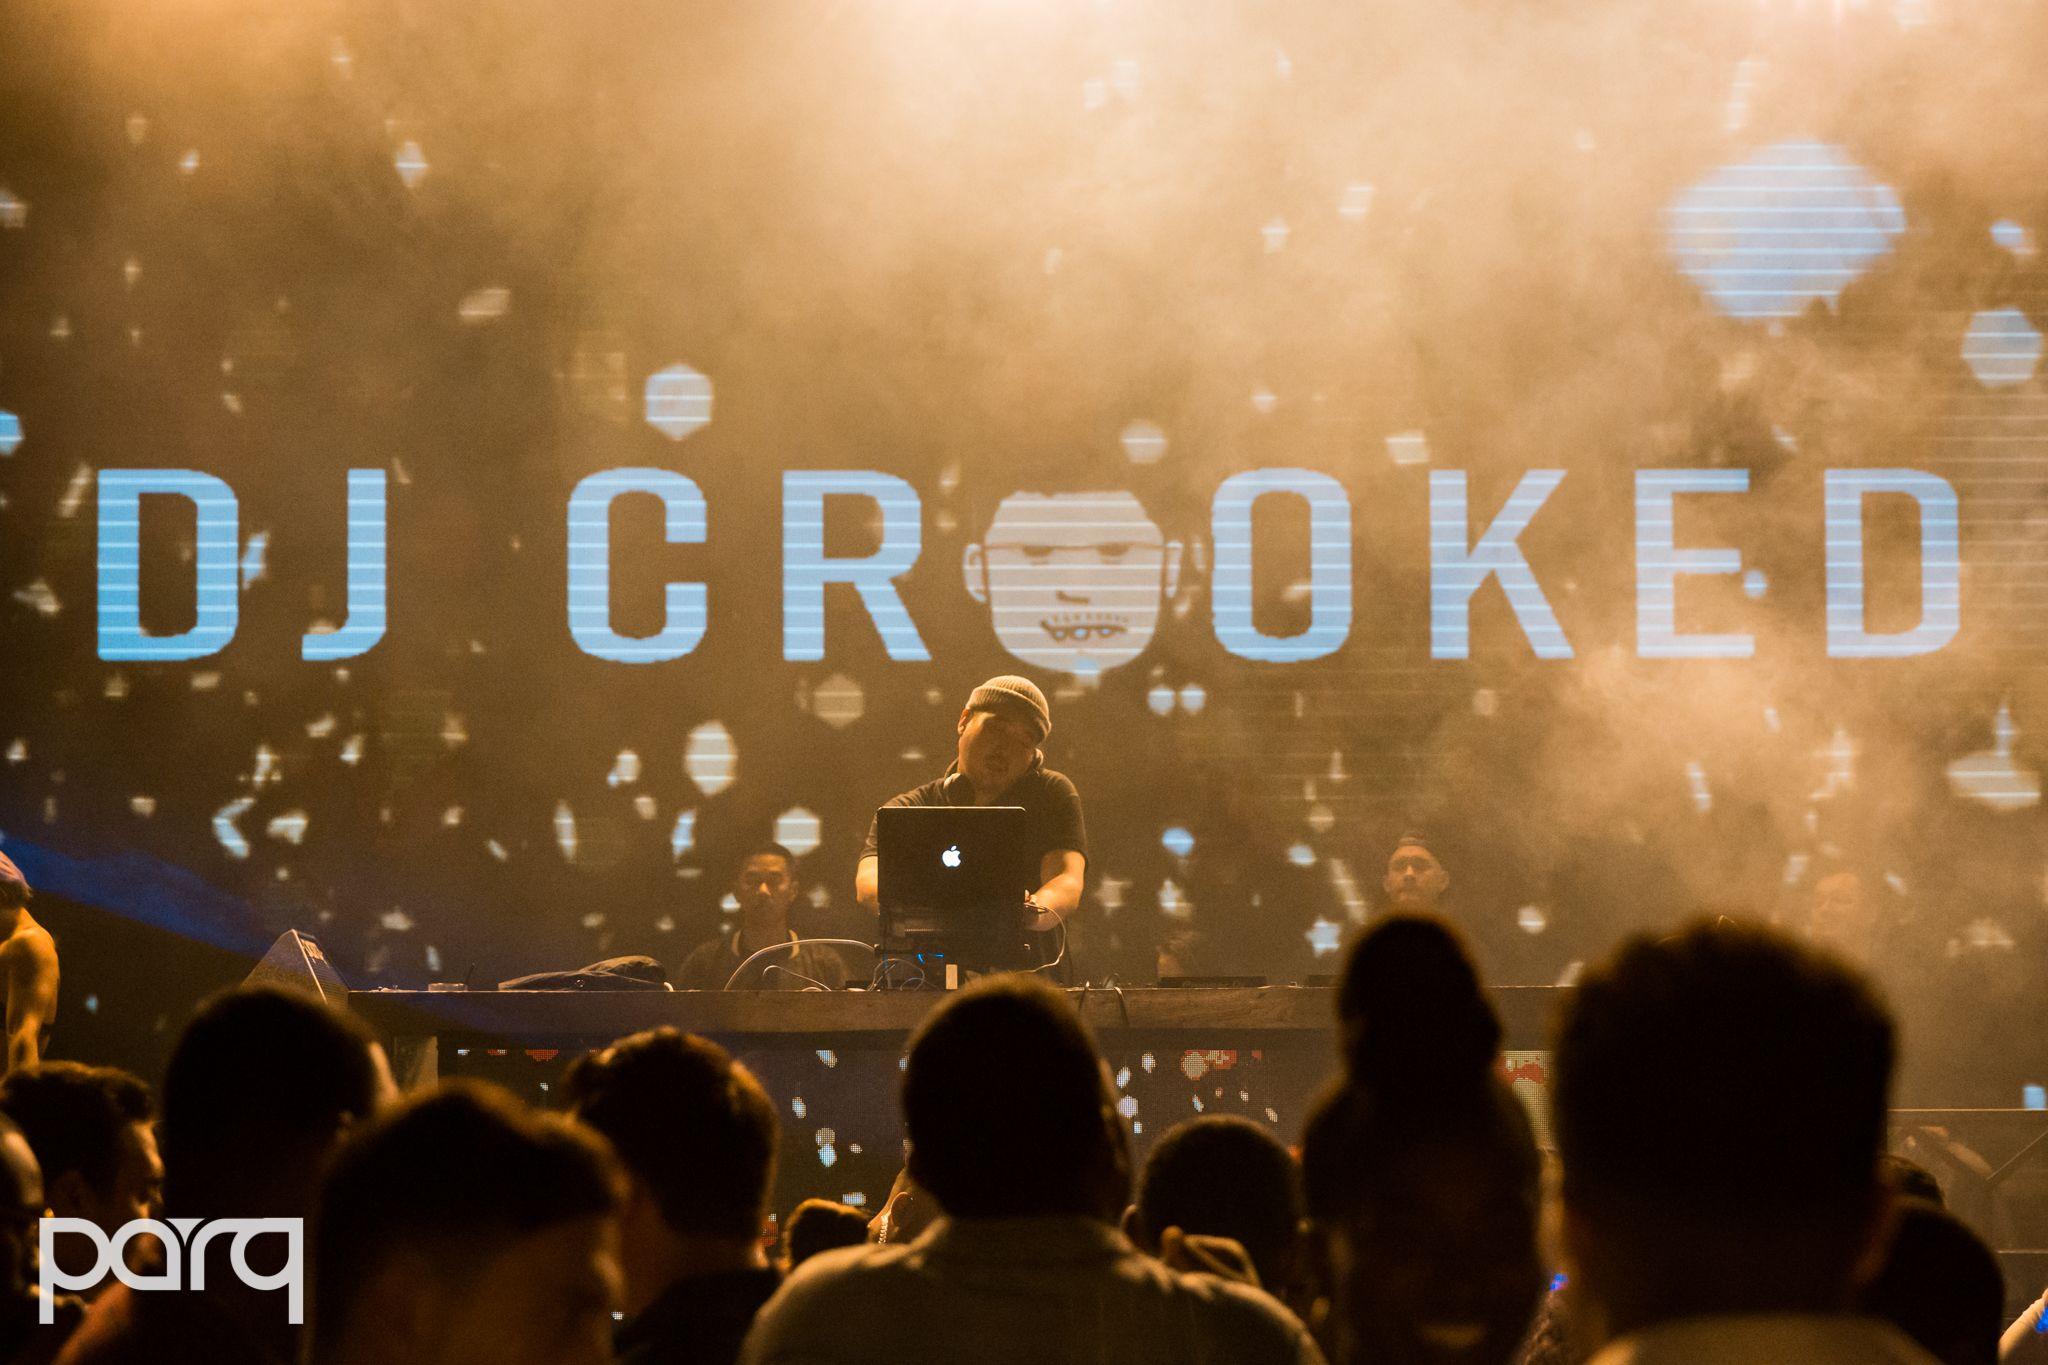 02.29.20 Parq - Crooked-23.jpg